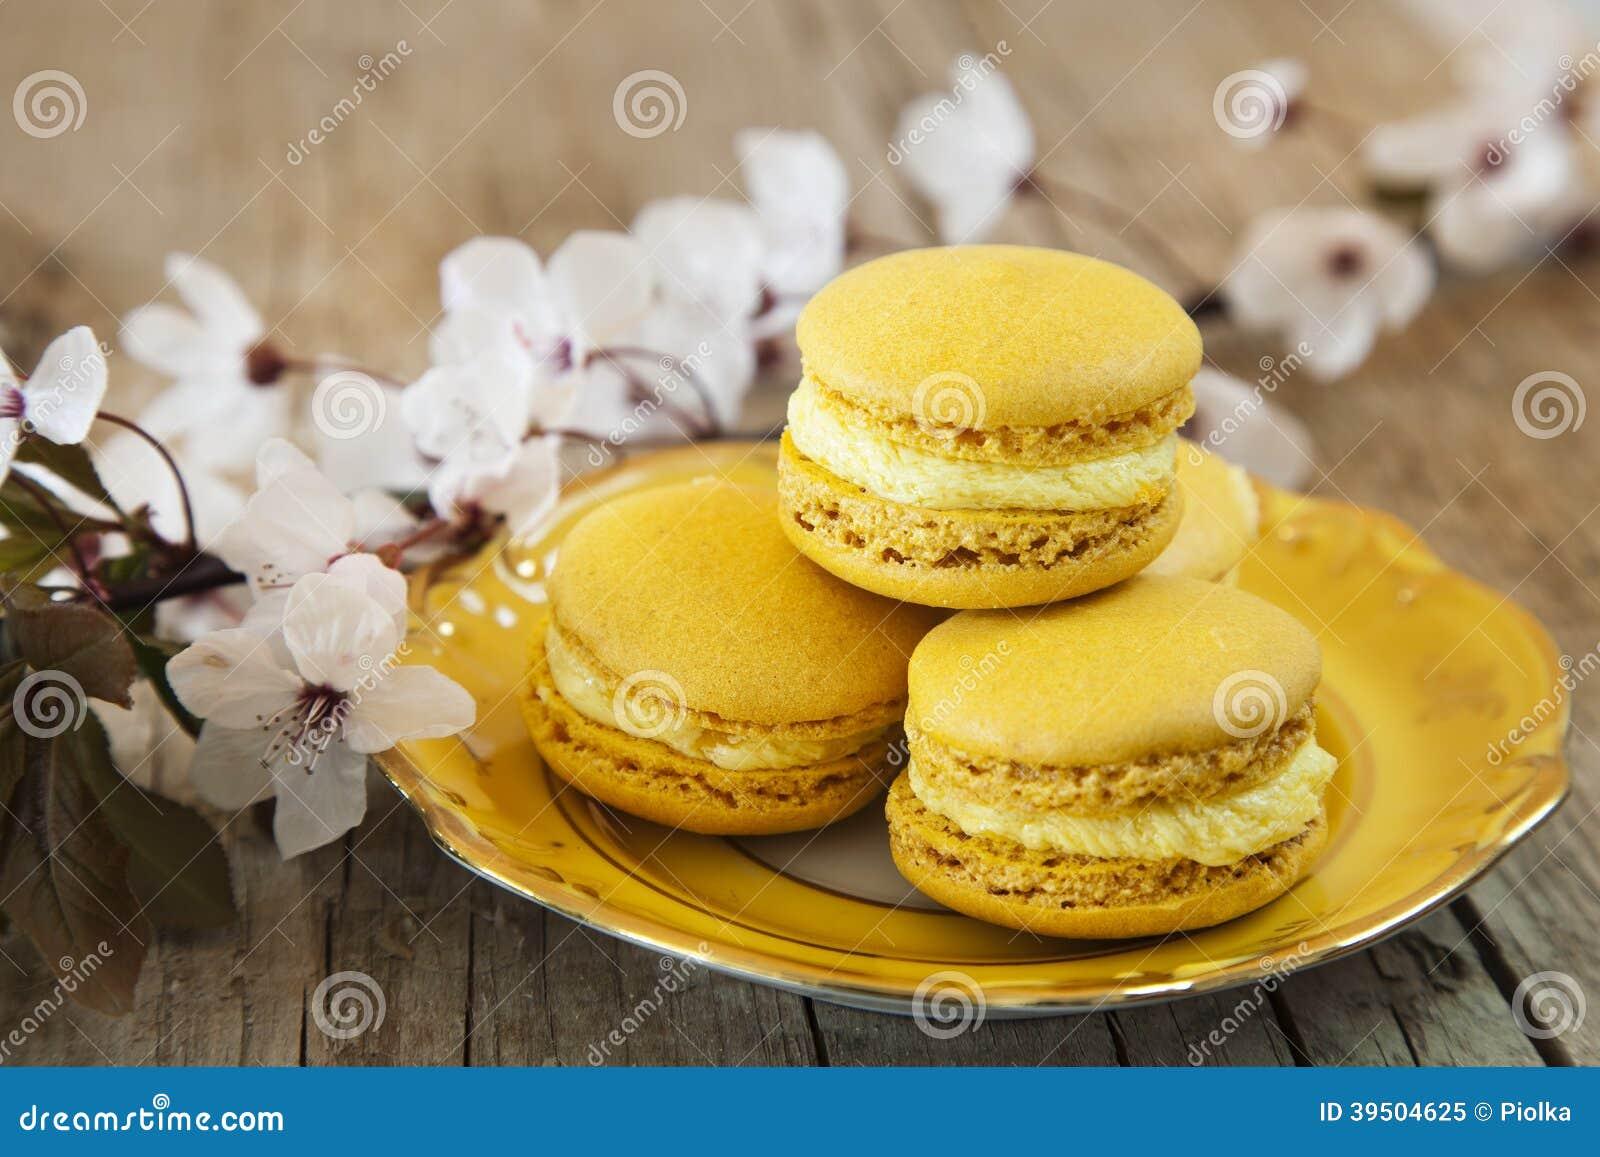 Sweet Macarons